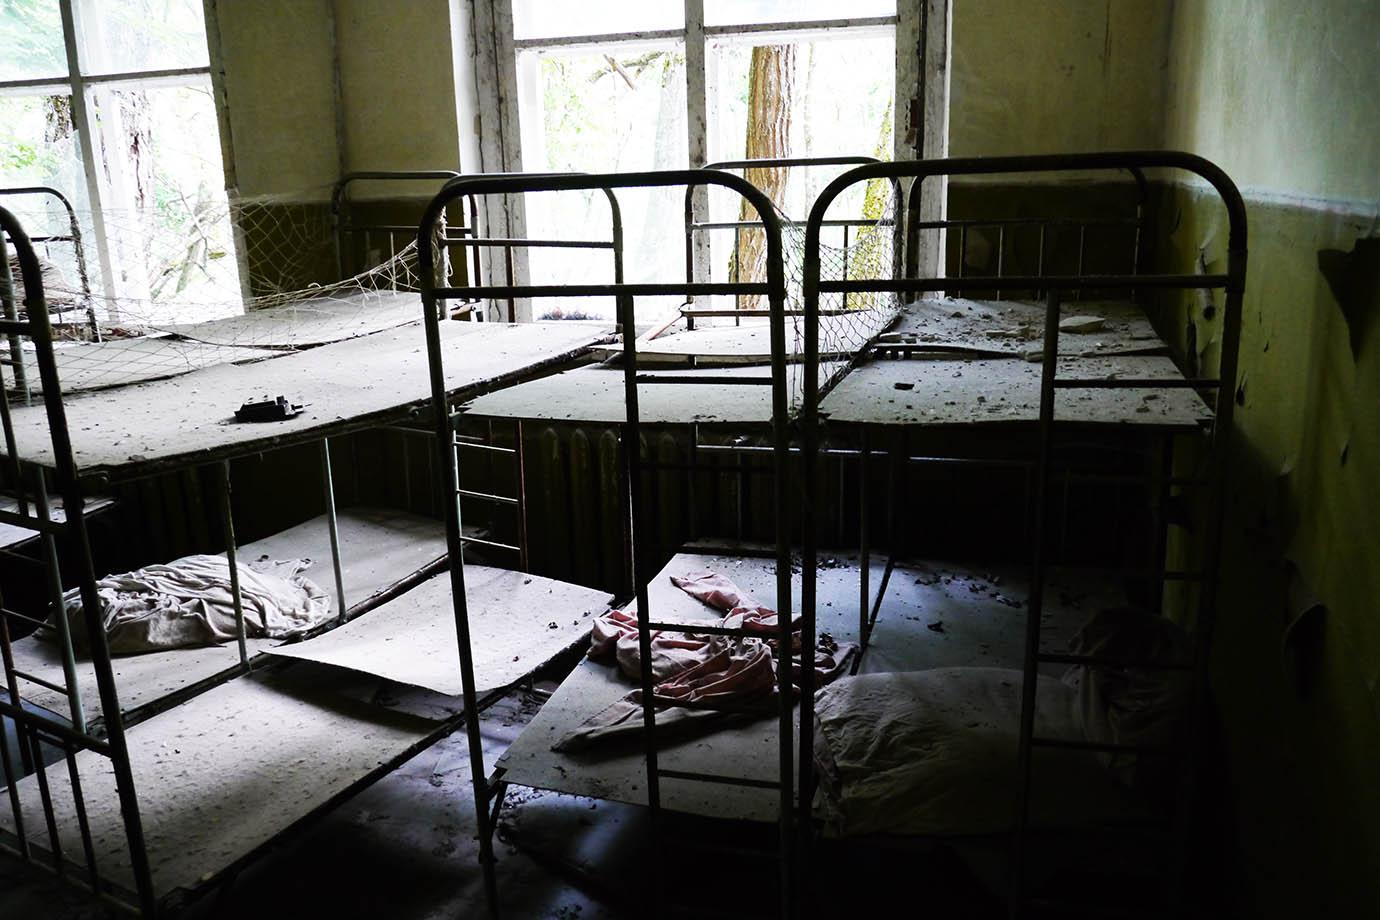 chernobyl-disaster12